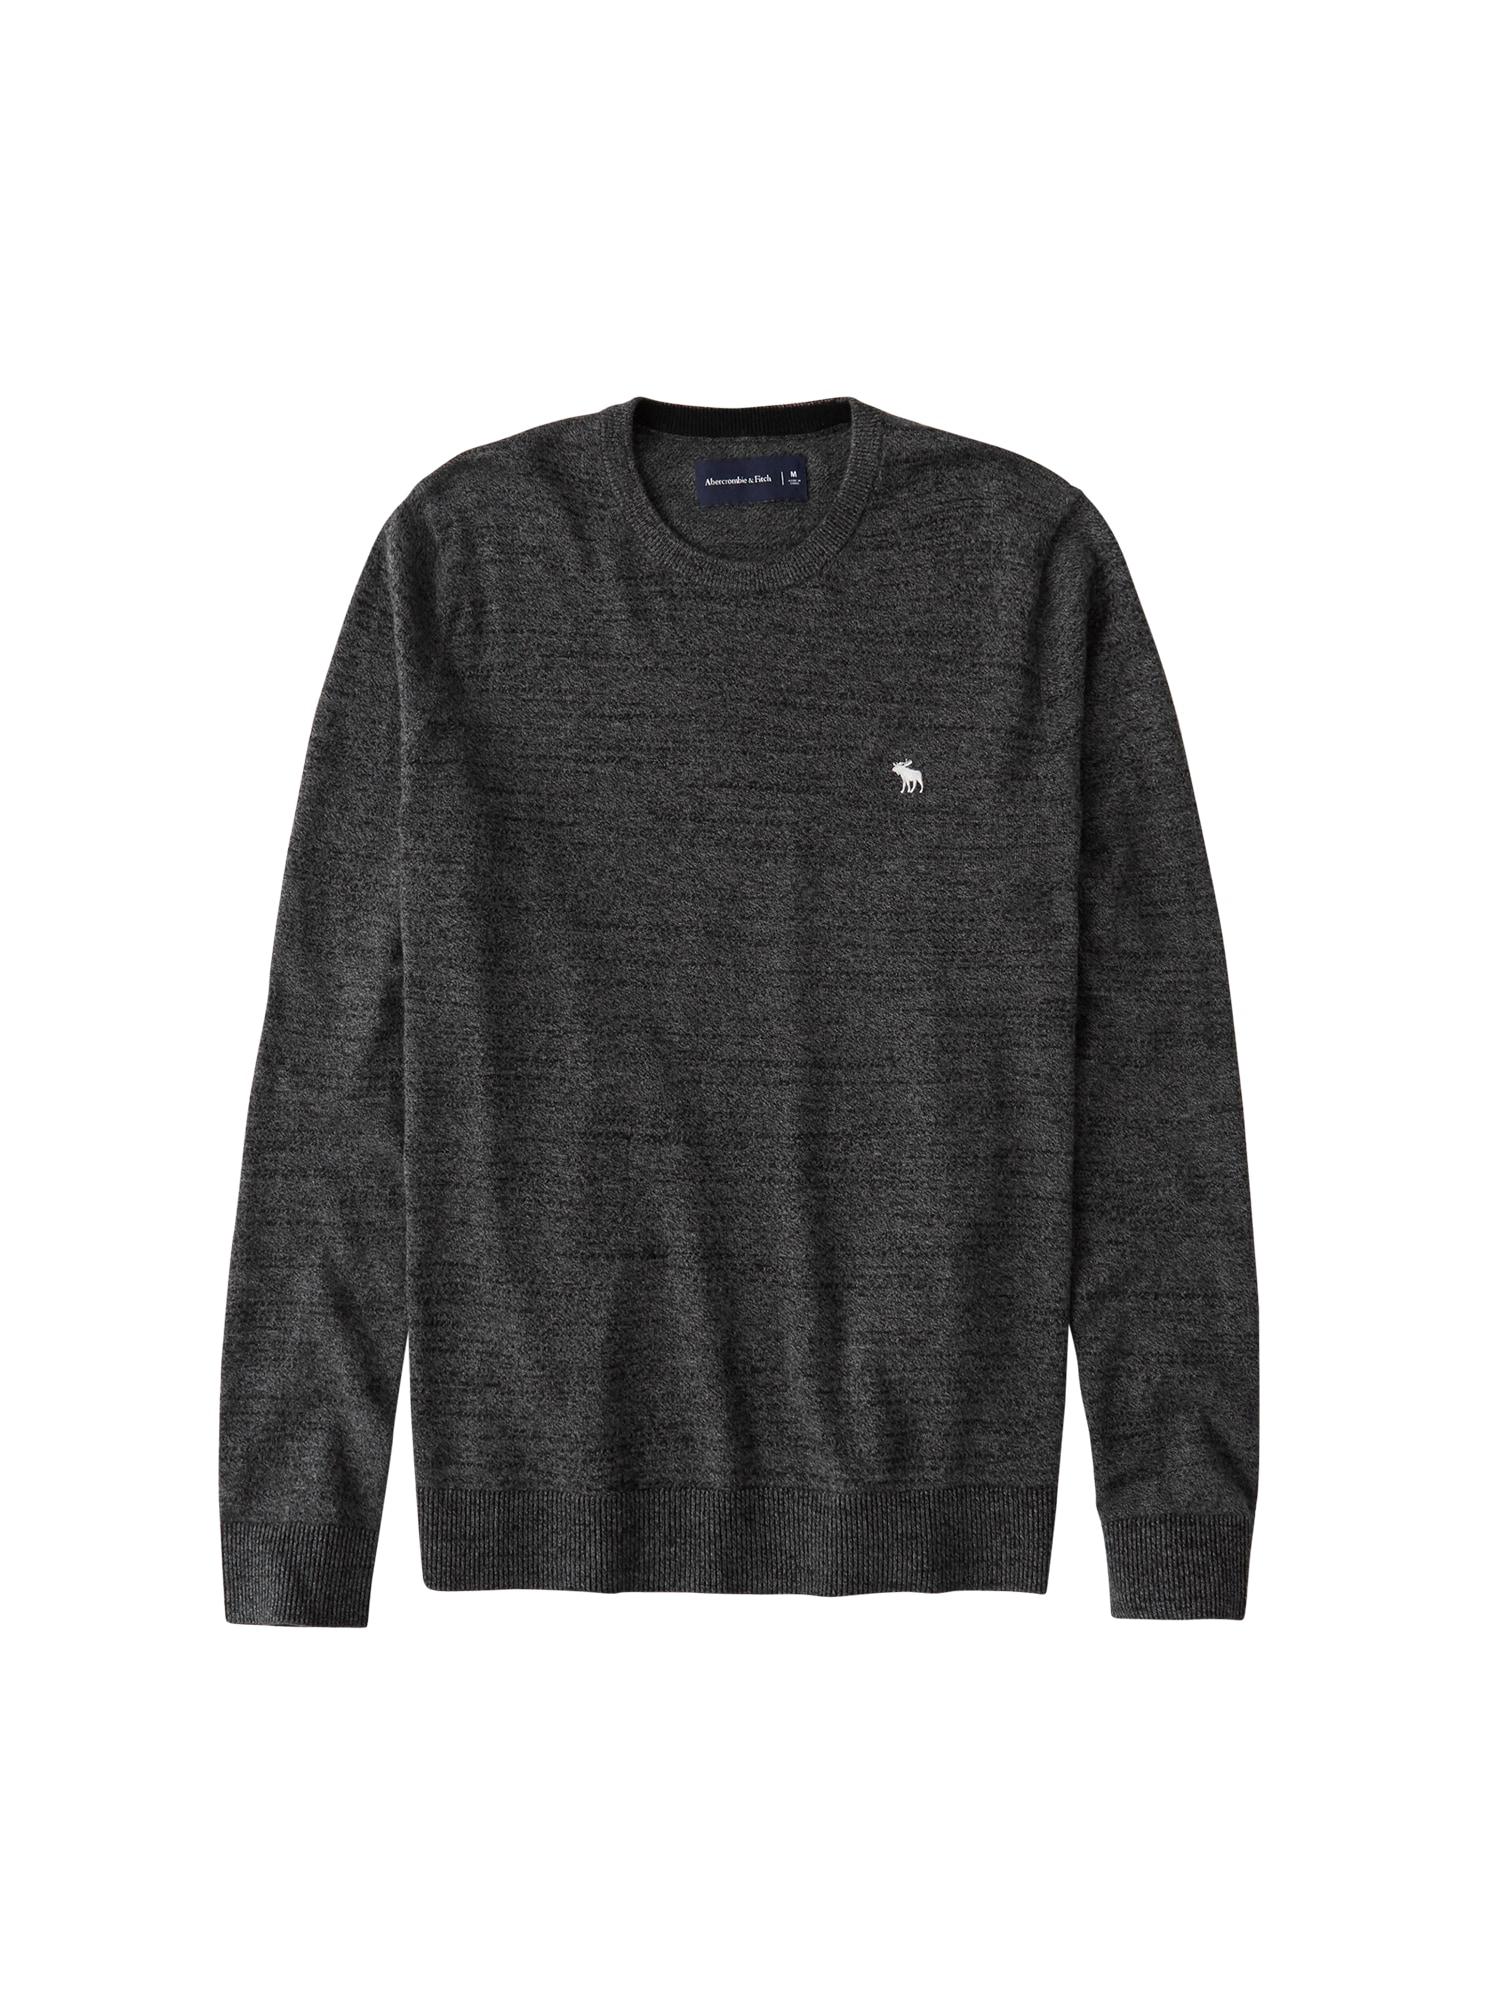 Abercrombie & Fitch Megztinis tamsiai pilka